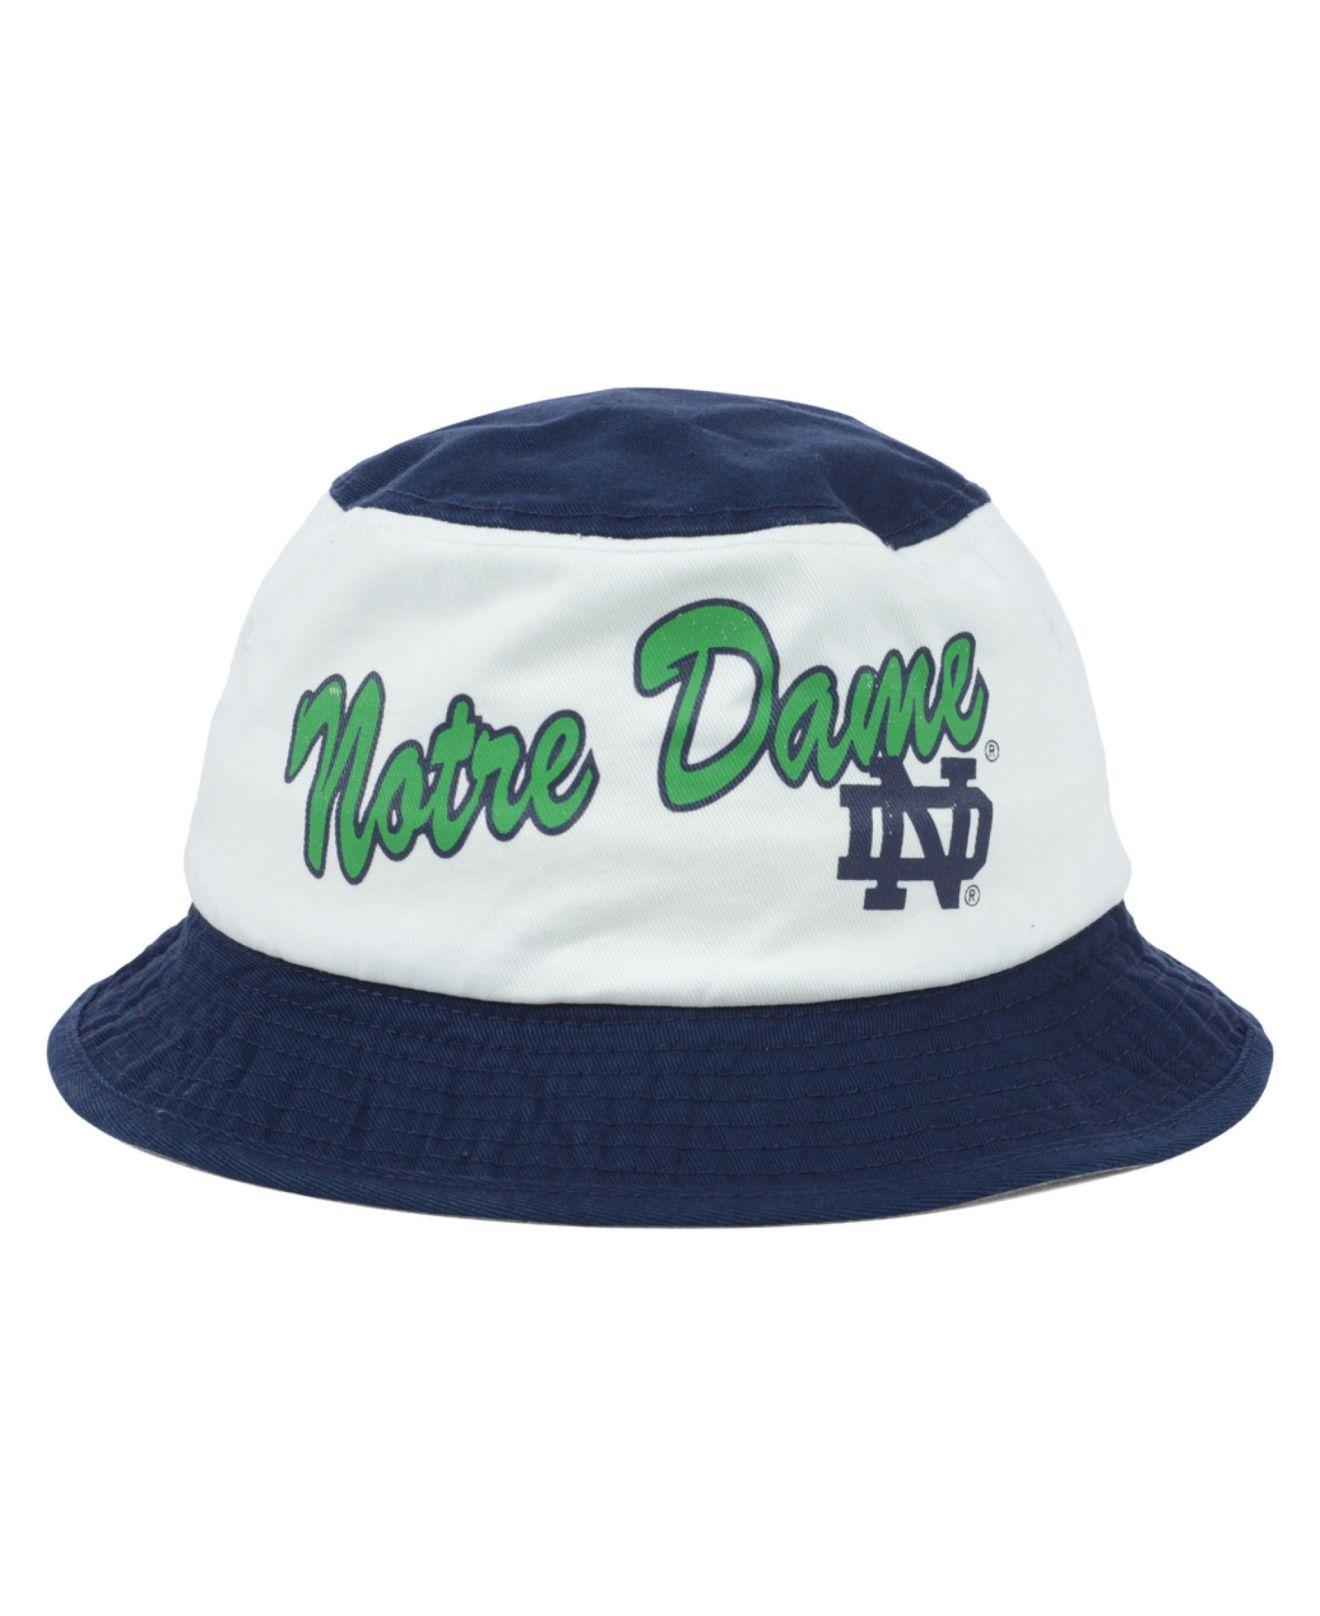 new arrival 5f36c cfbf6 adidas Notre Dame Fighting Irish Script Bucket Hat in Blue for Men ...